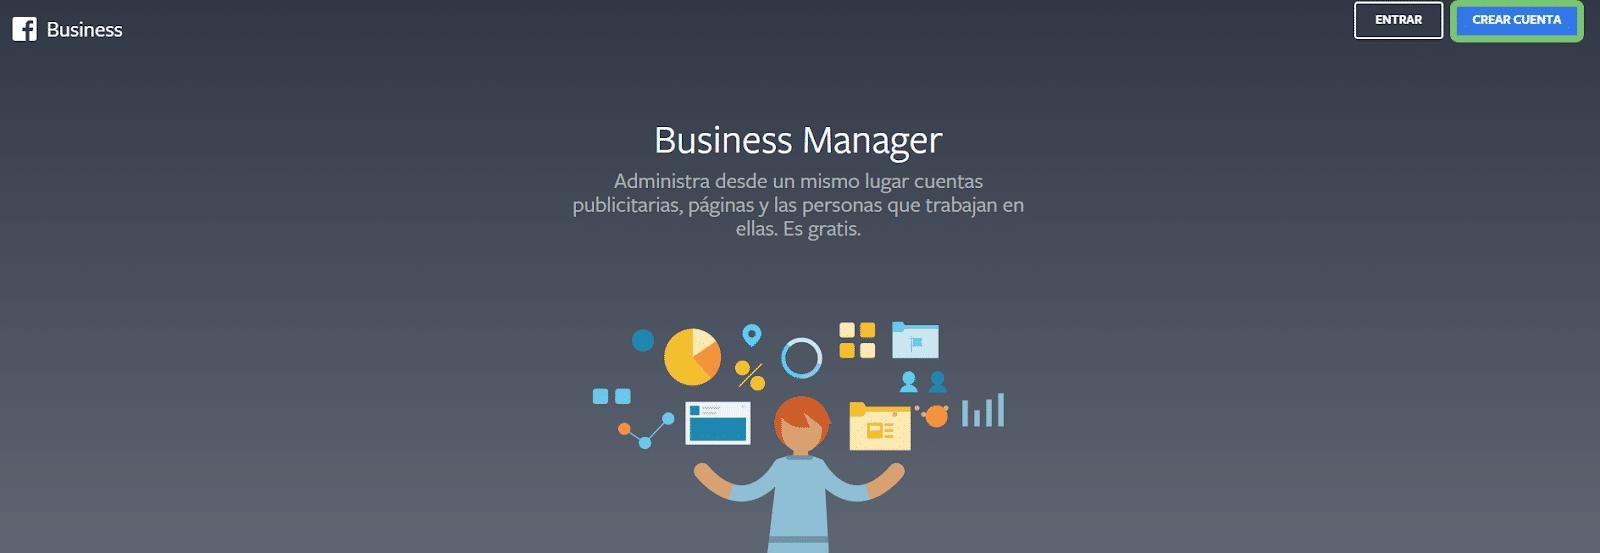 Inicio Business Manager